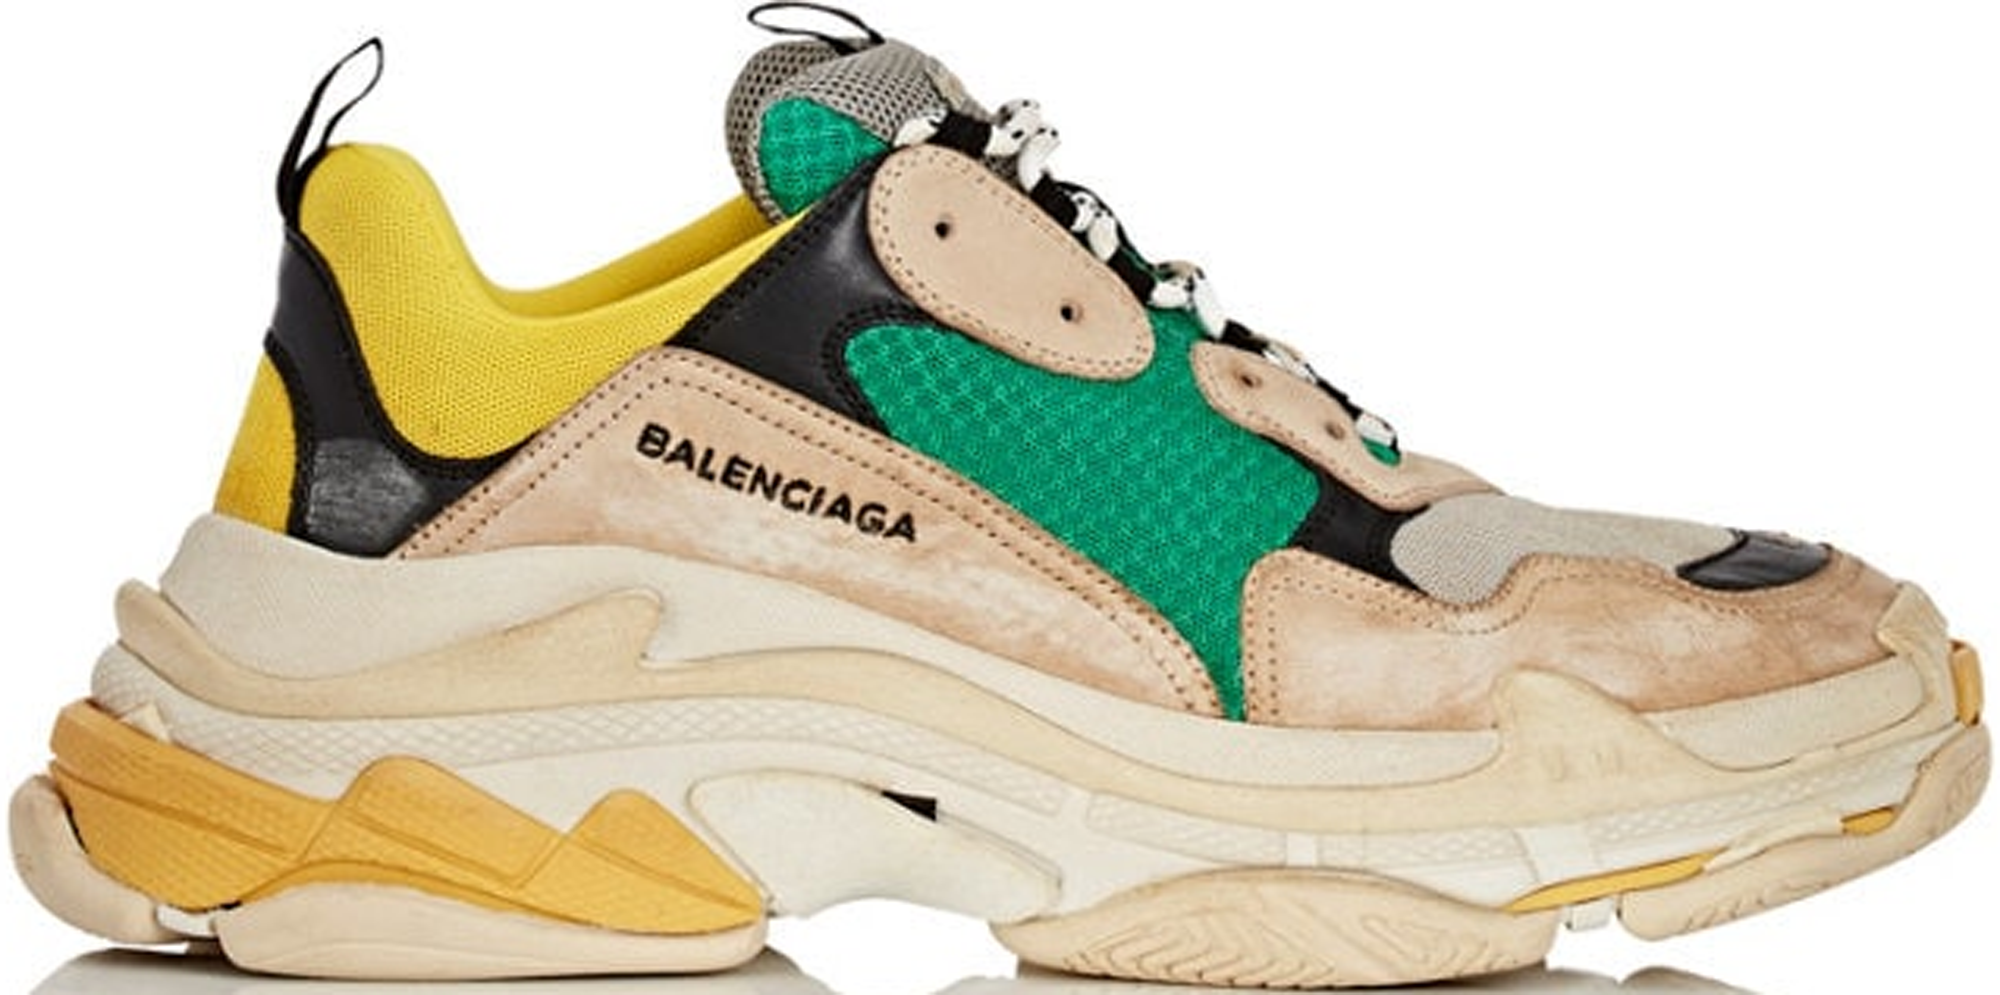 Balenciaga Triple S Beige Green Yellow (2018 Reissue)